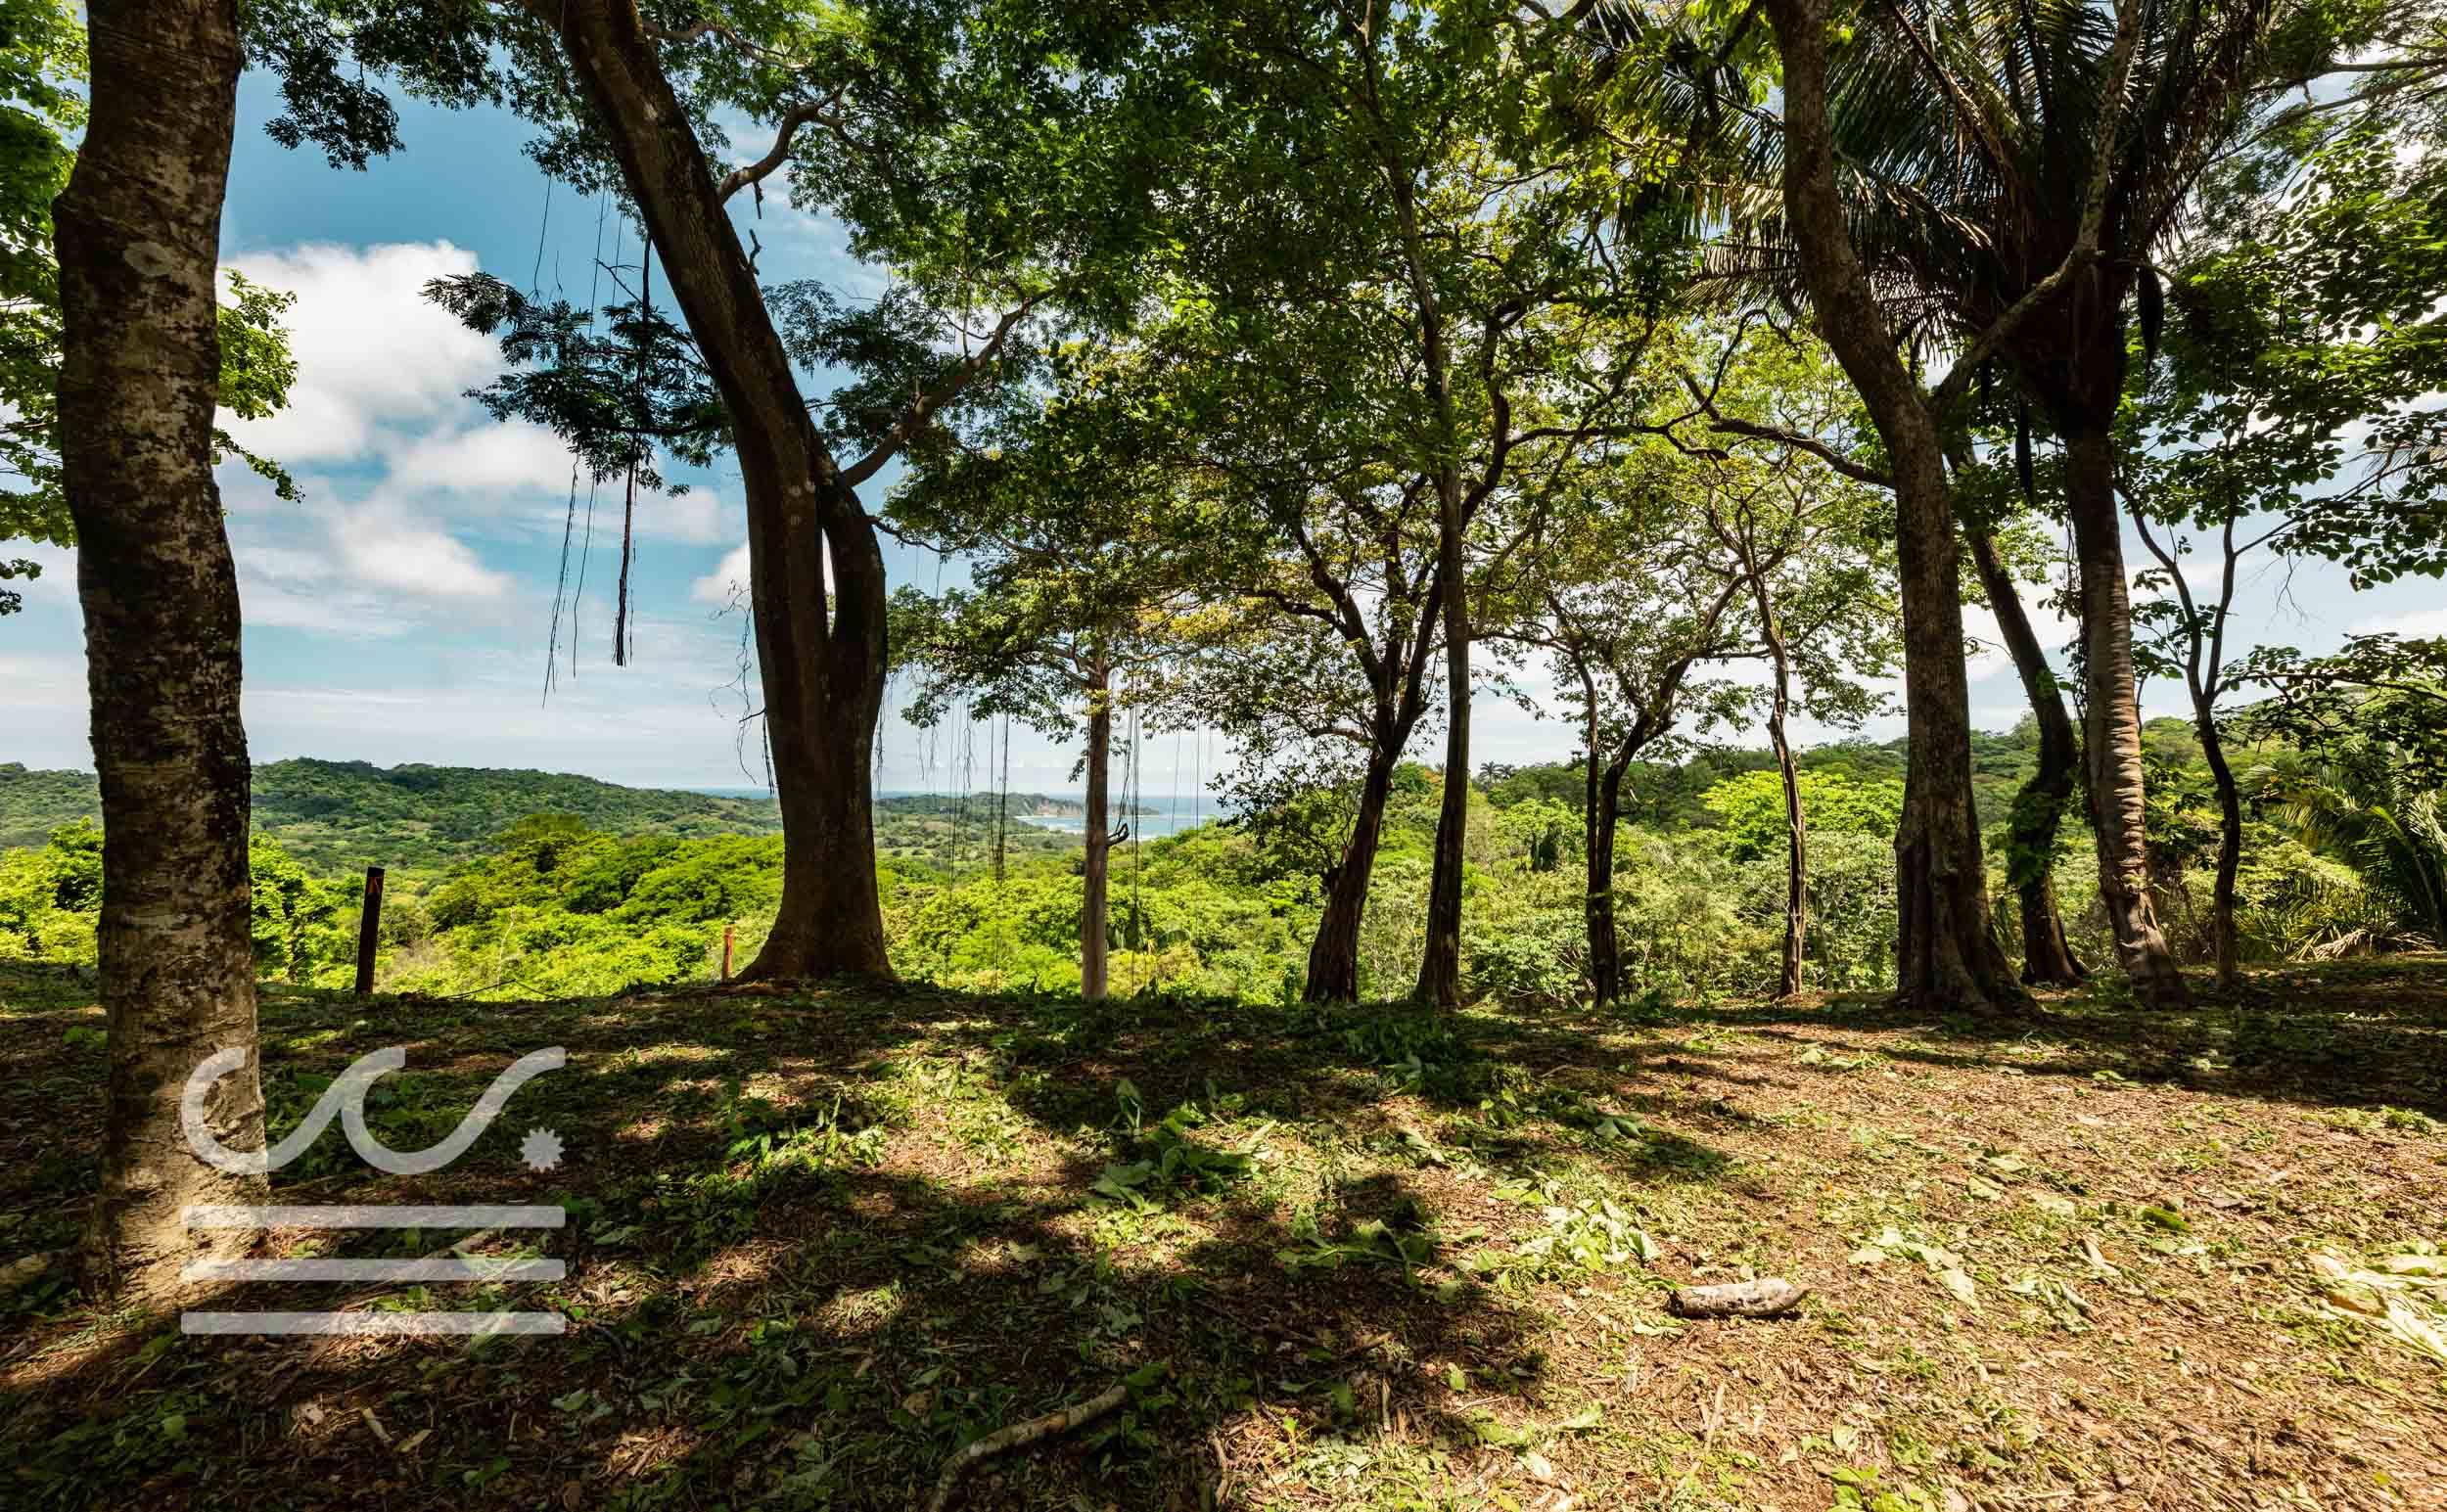 EE-102-Lot-Wanderlust-Realty-Real-Estate-Nosara-Costa-Rica-9.jpg